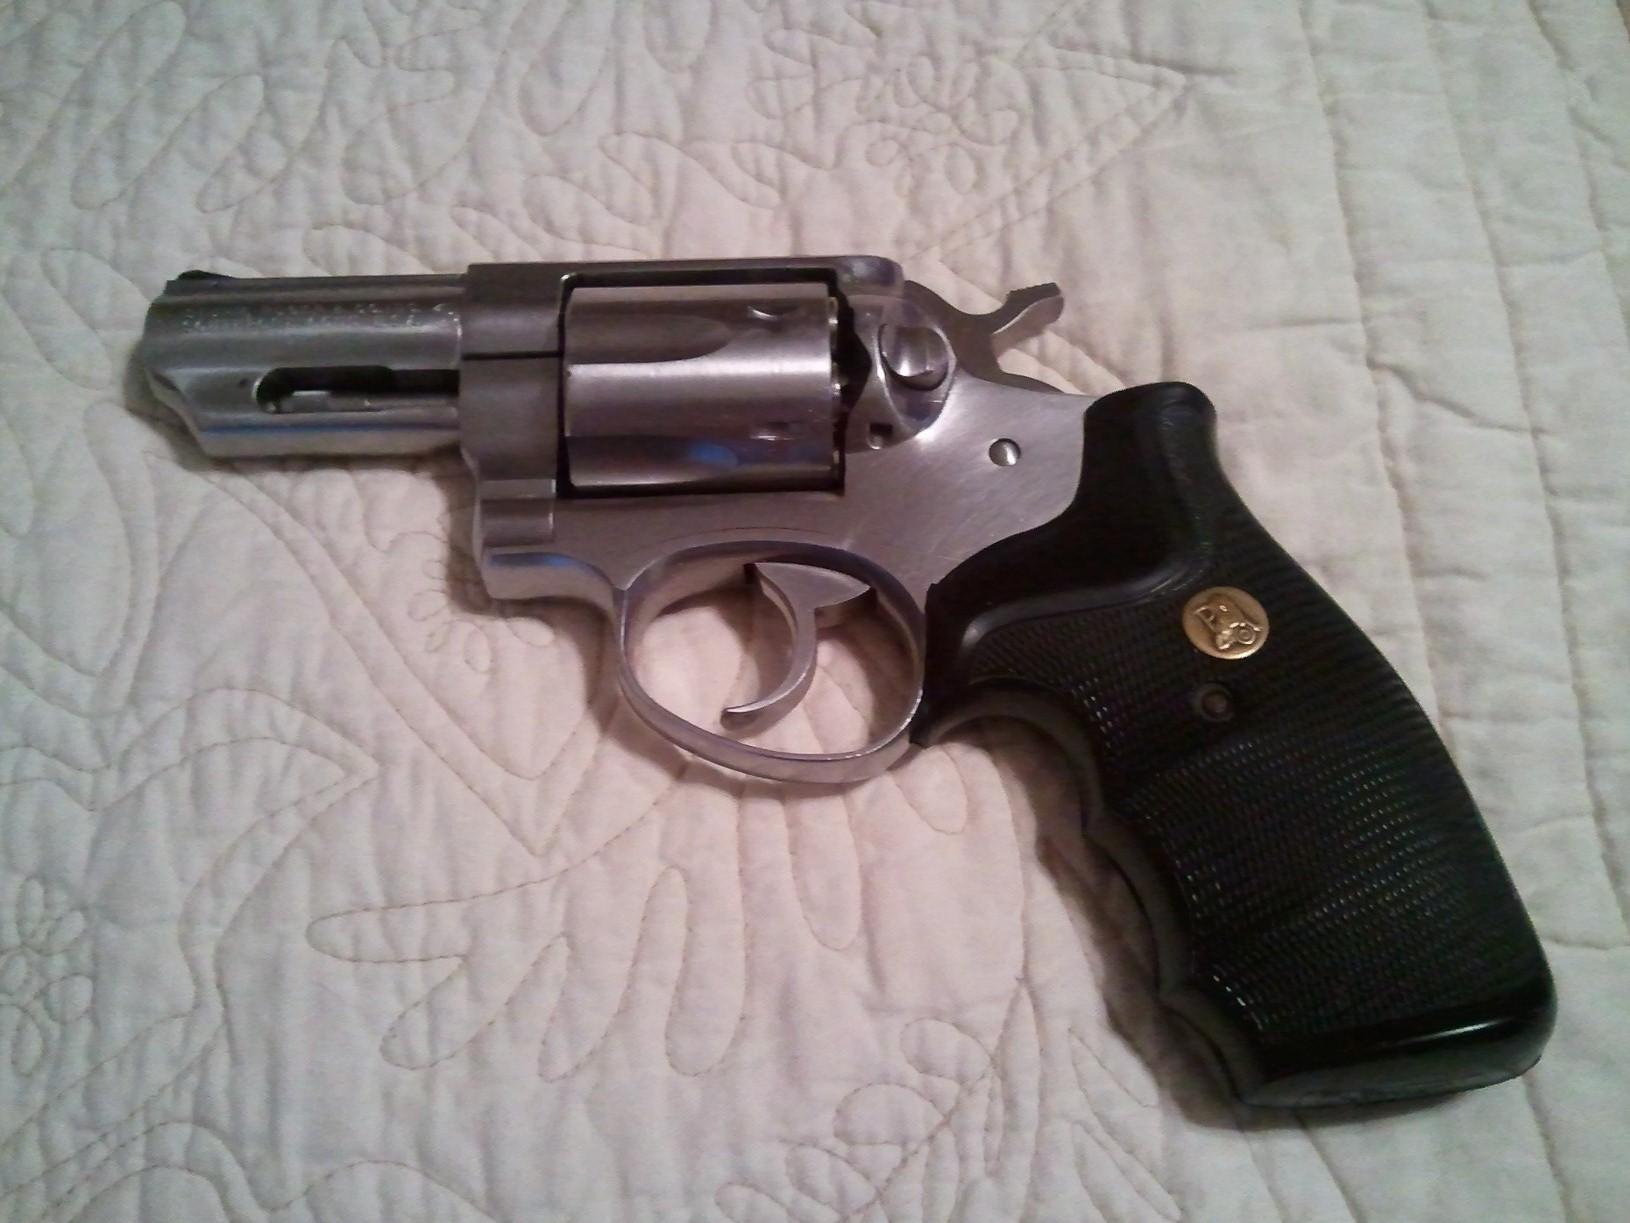 Image result for gun in bed